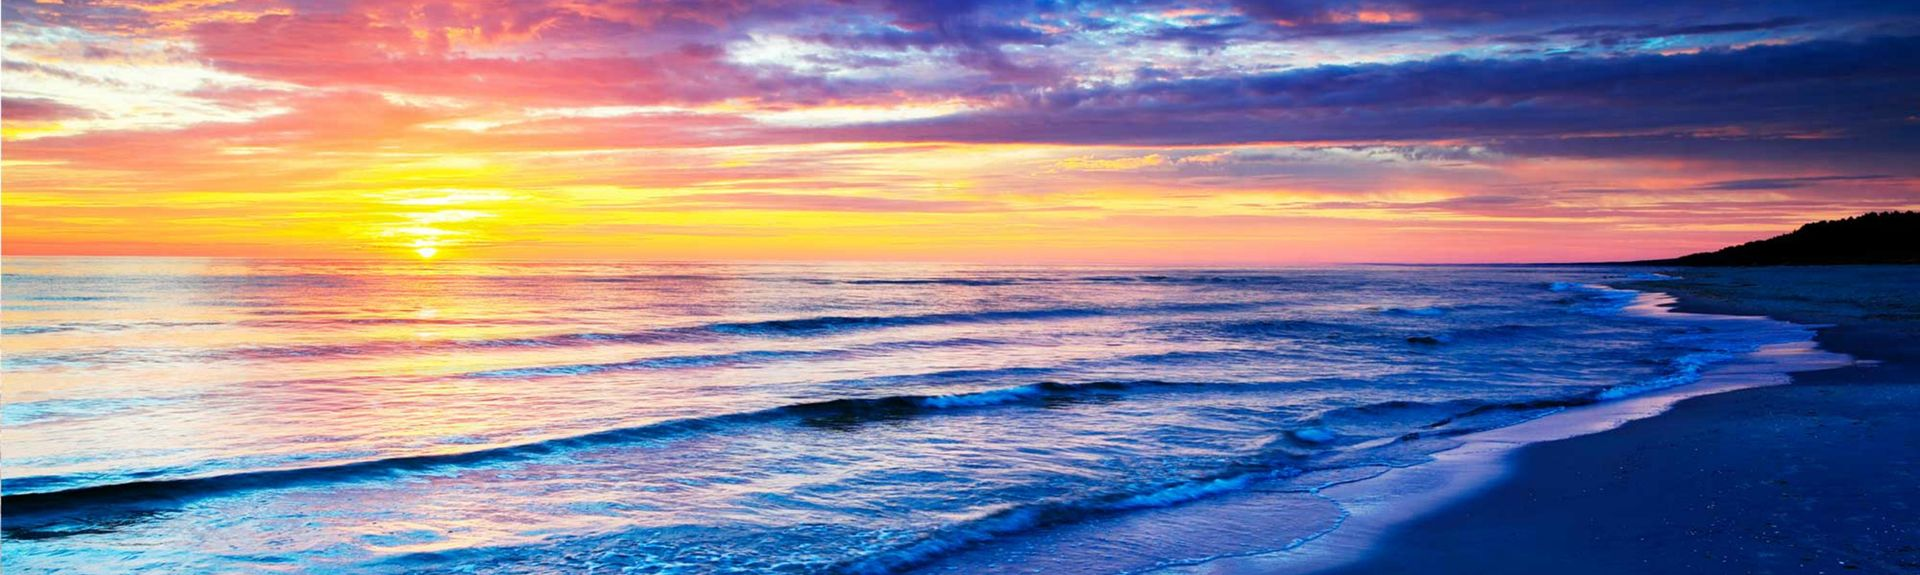 Tidewater Beach Resort (Panama City Beach, Florida, Estados Unidos)